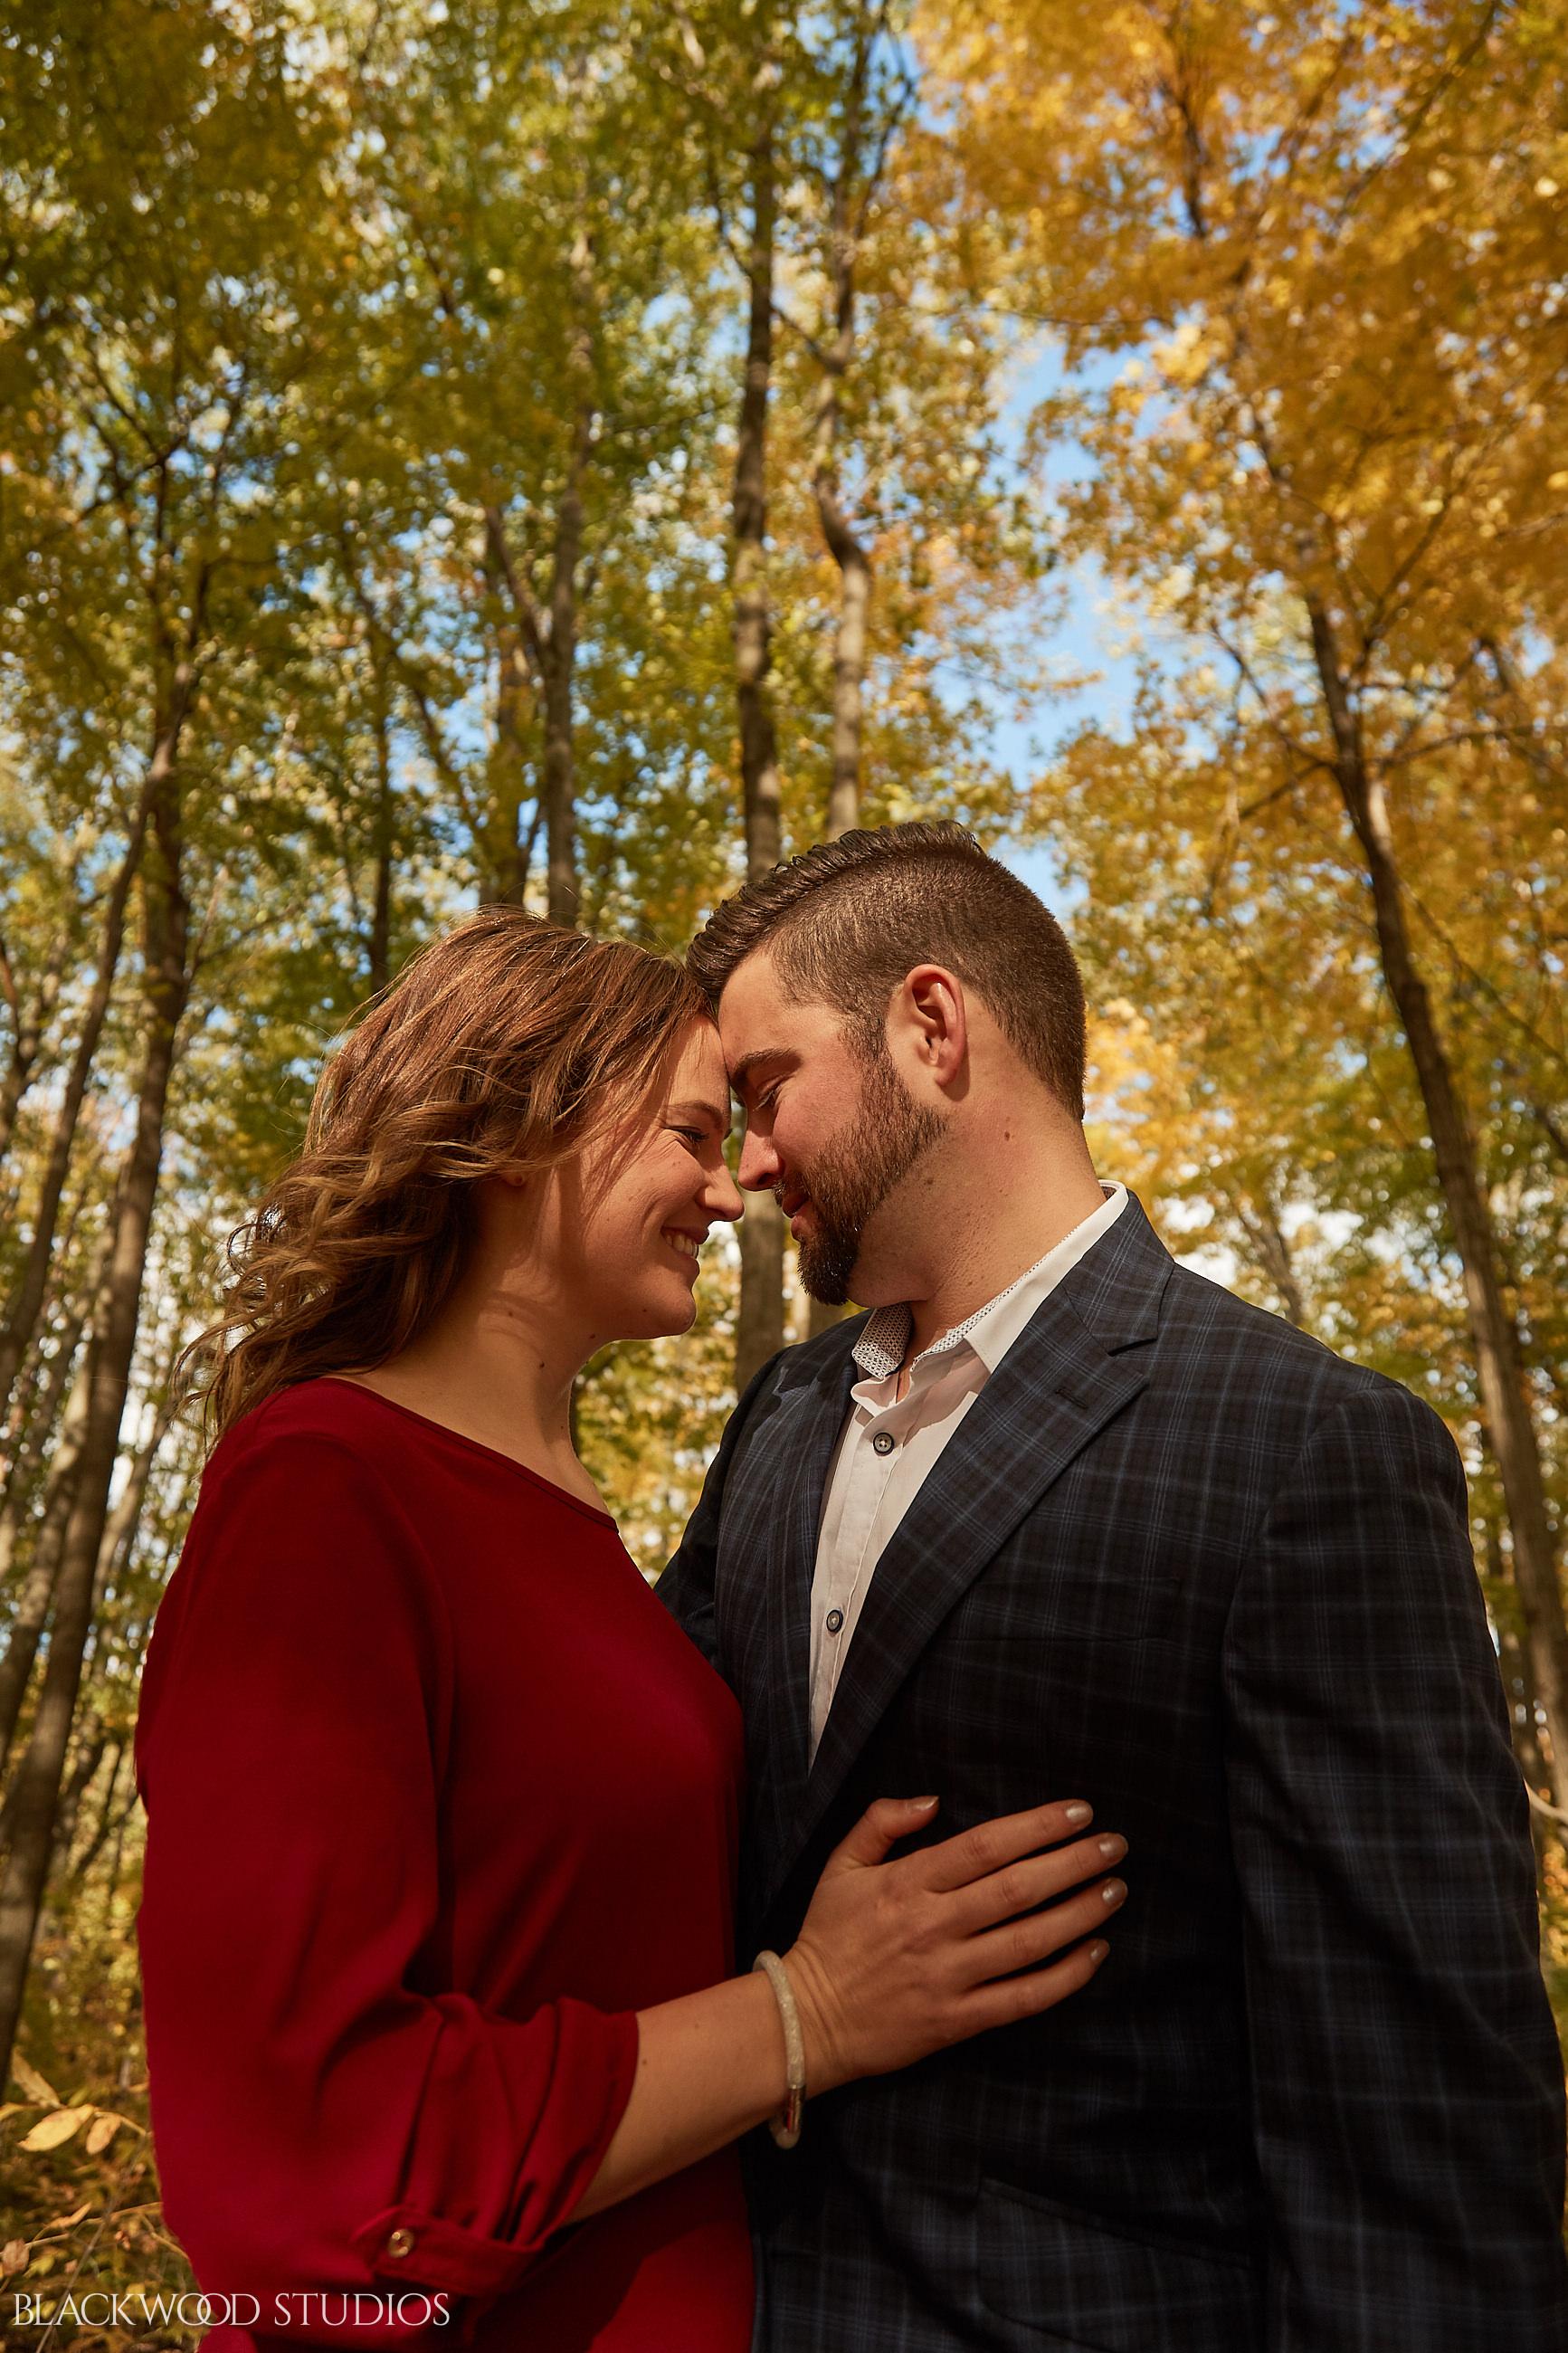 Blackwood-Studios-20181014-160900-Dave-and-Natalie-Engagement-0507-Rattlesnake-Point-Conservation-Area-Milton-Ontario.jpg